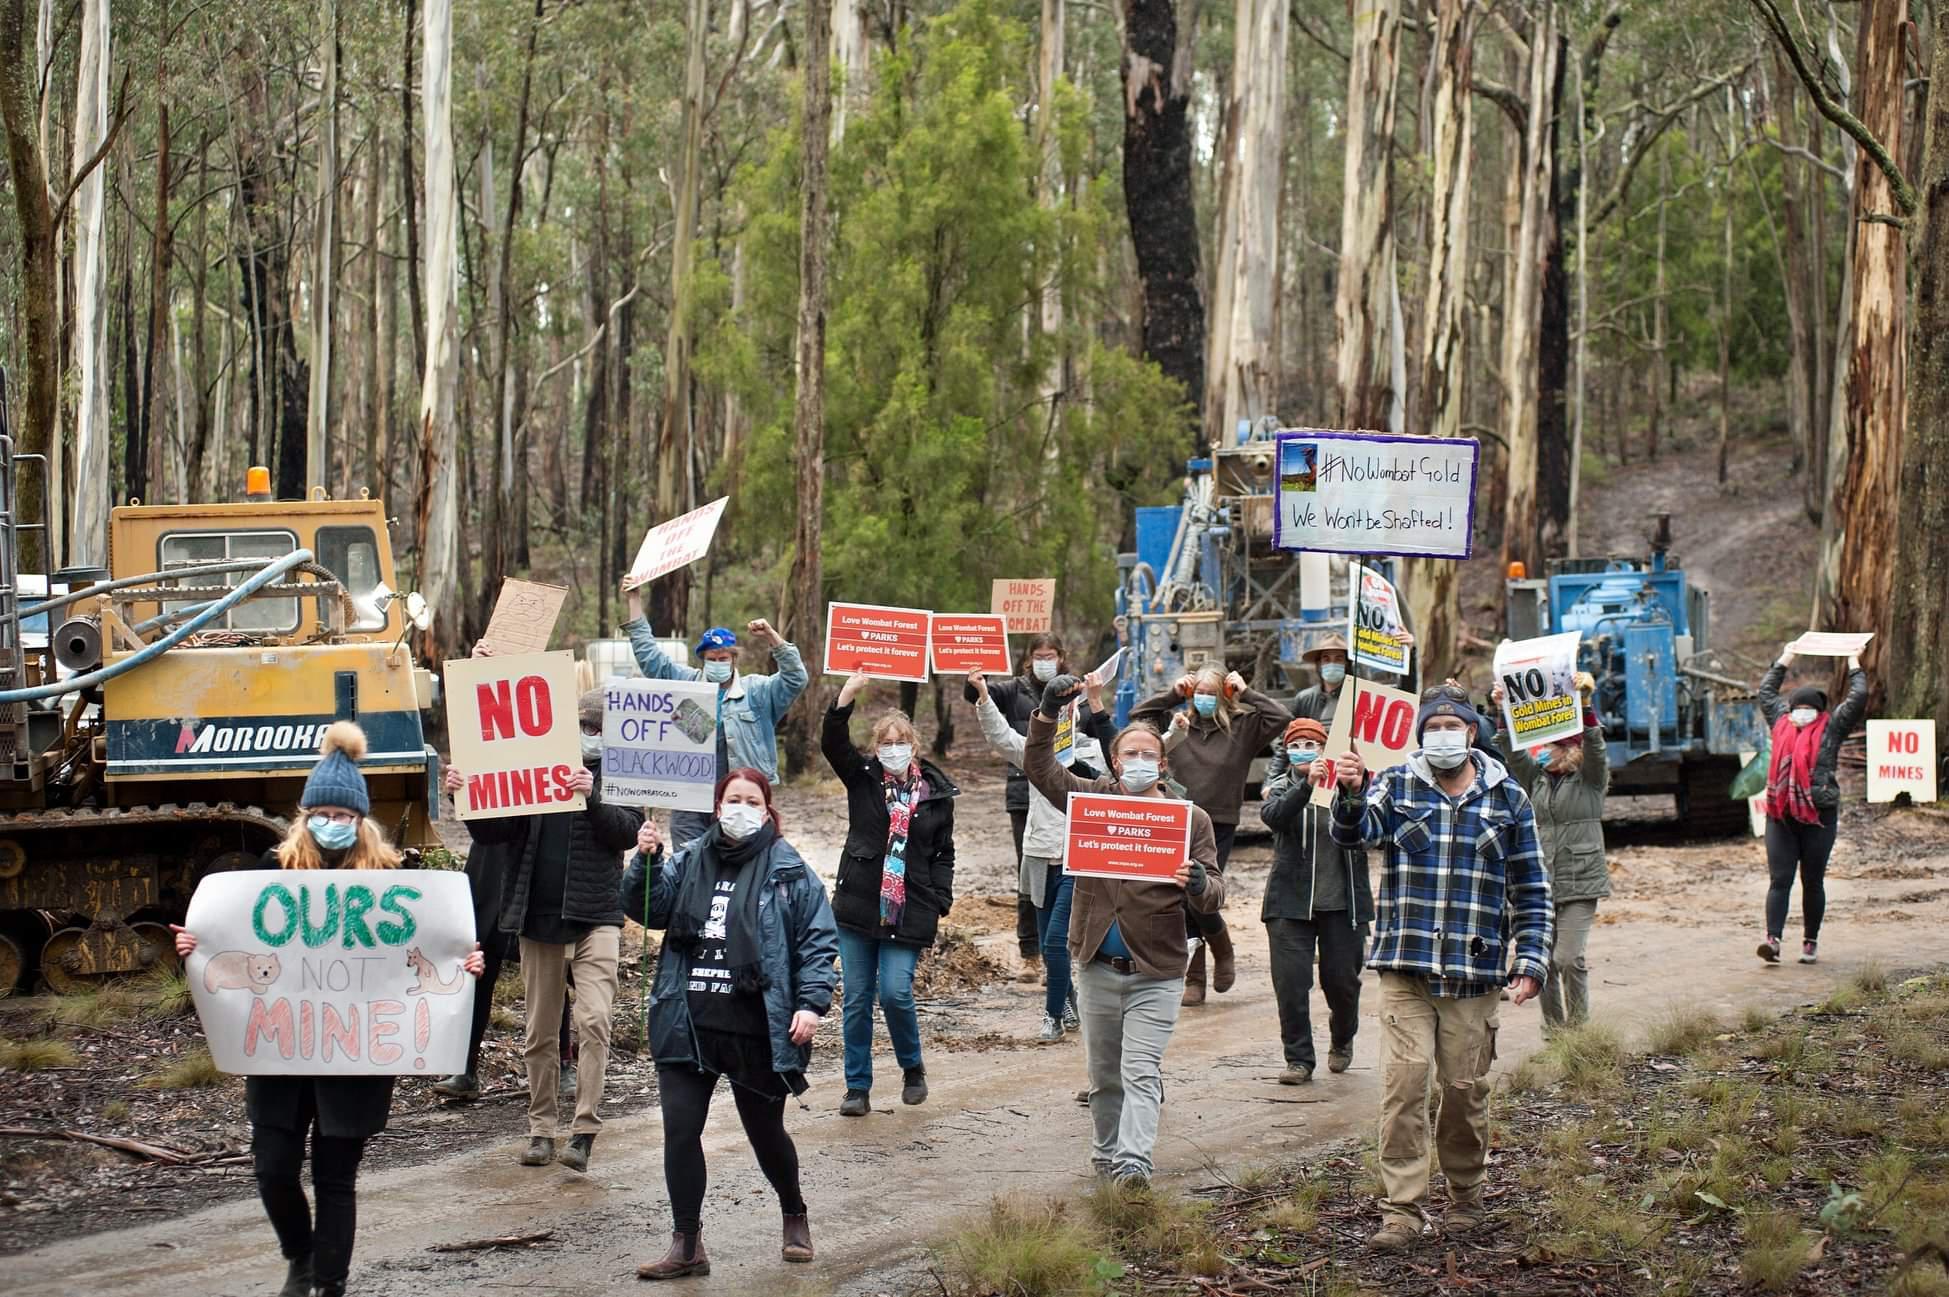 No Wombat Mining